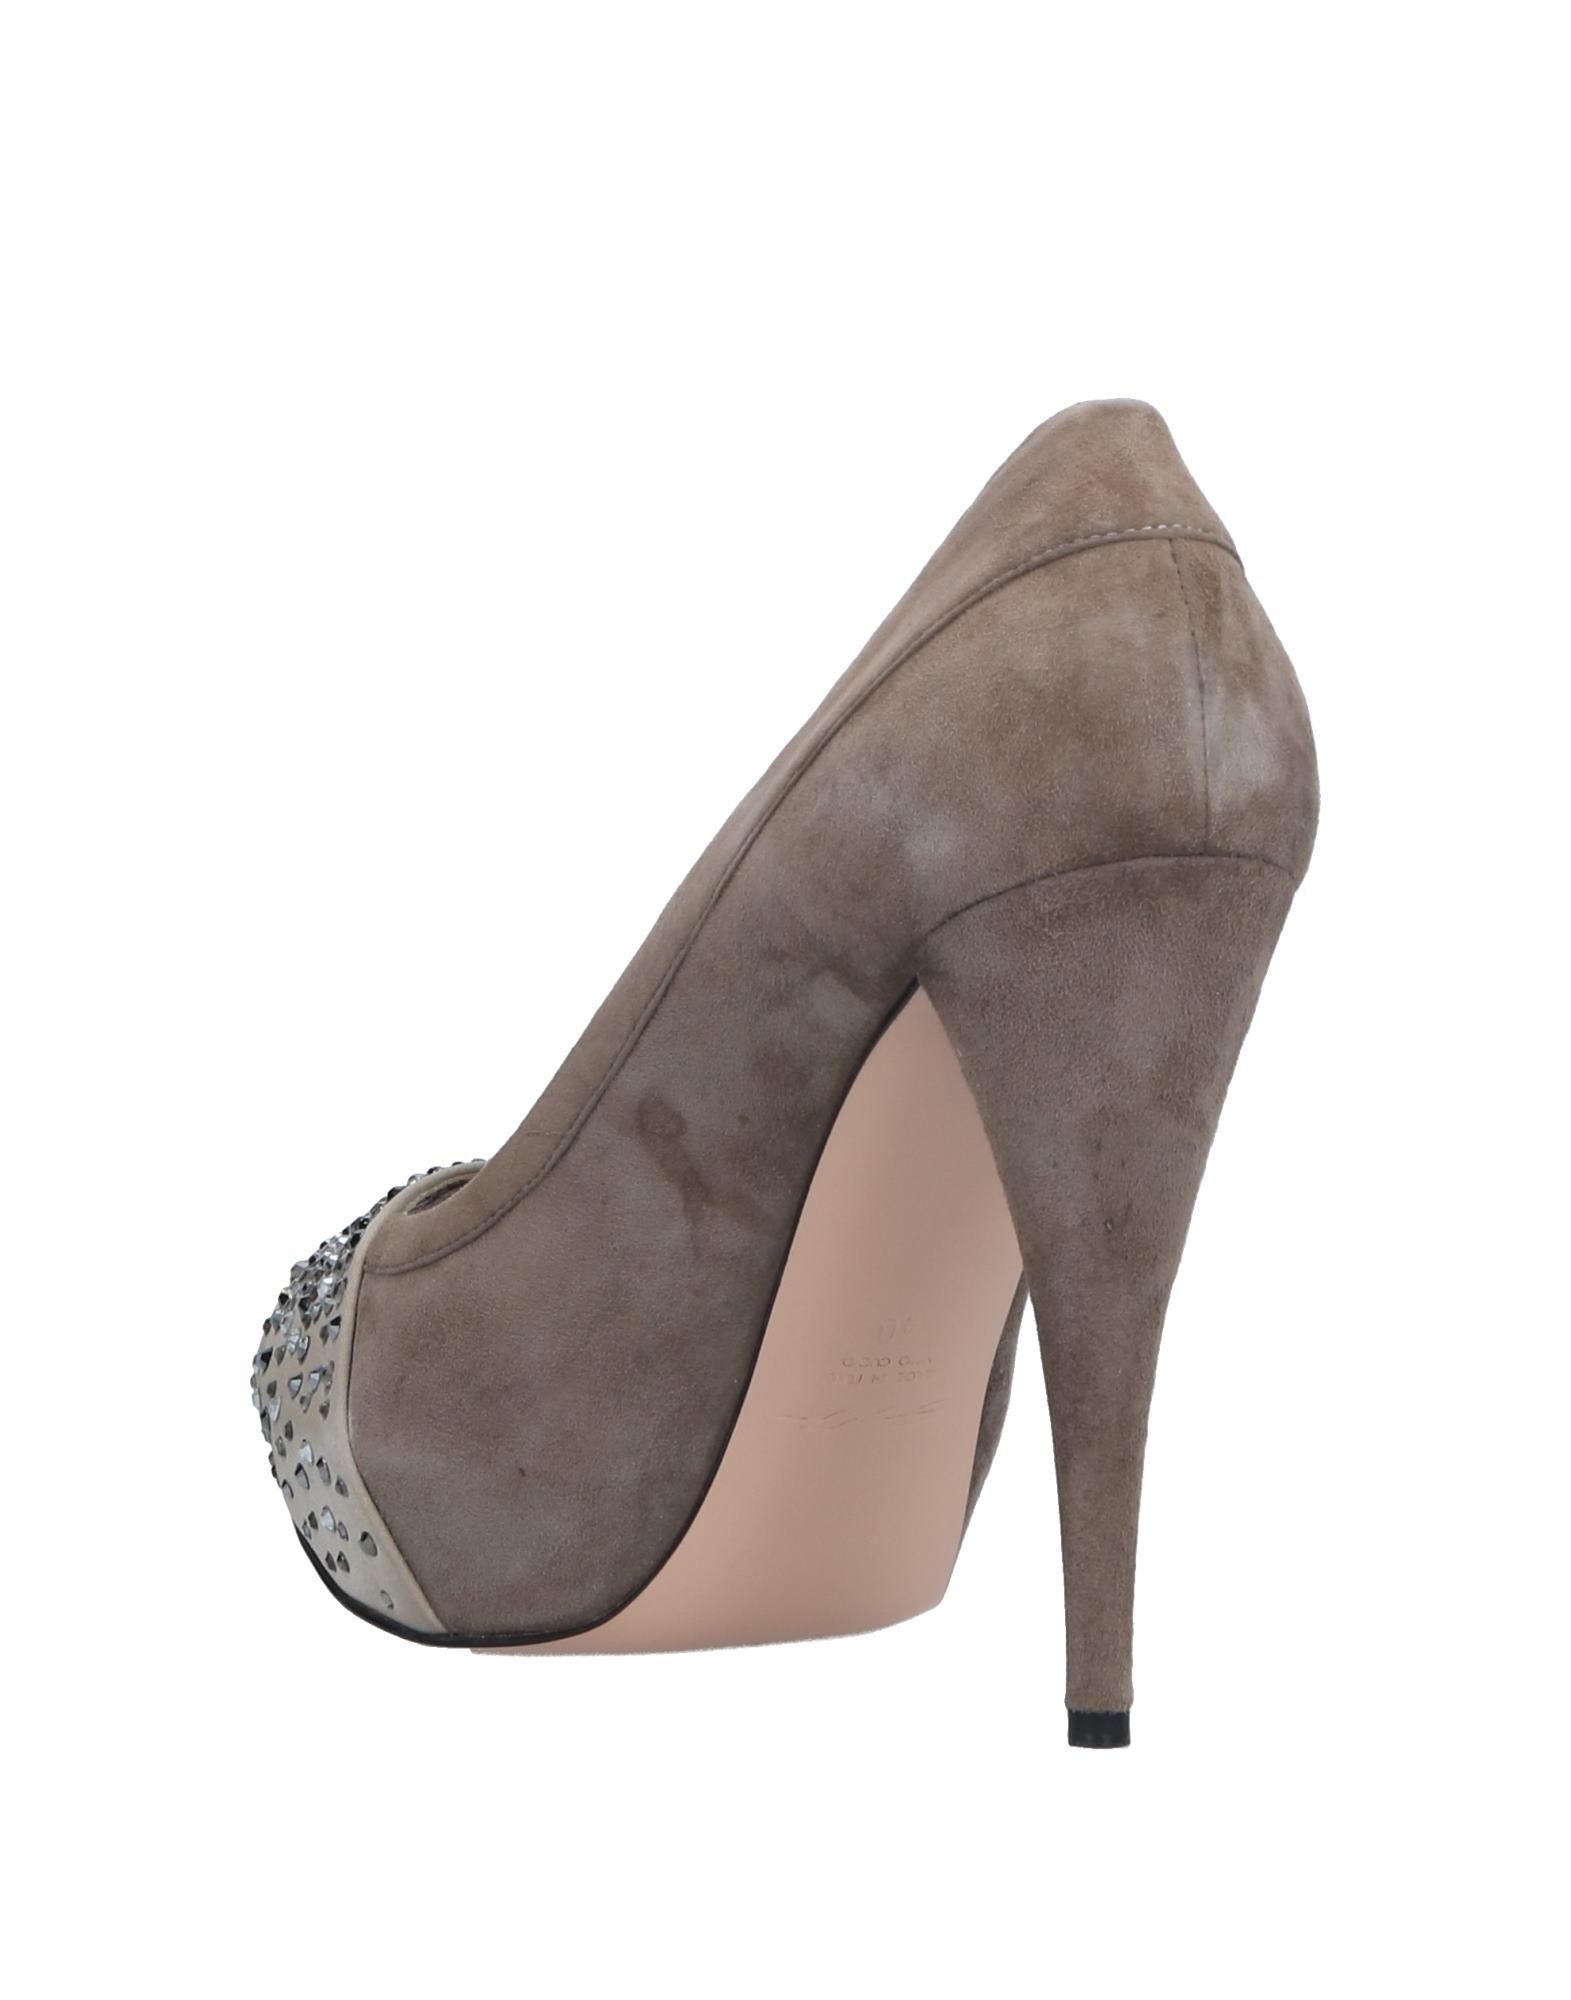 Stilvolle billige Schuhe Damen Grau Mer Pumps Damen Schuhe  11542825GJ 4f0ef9